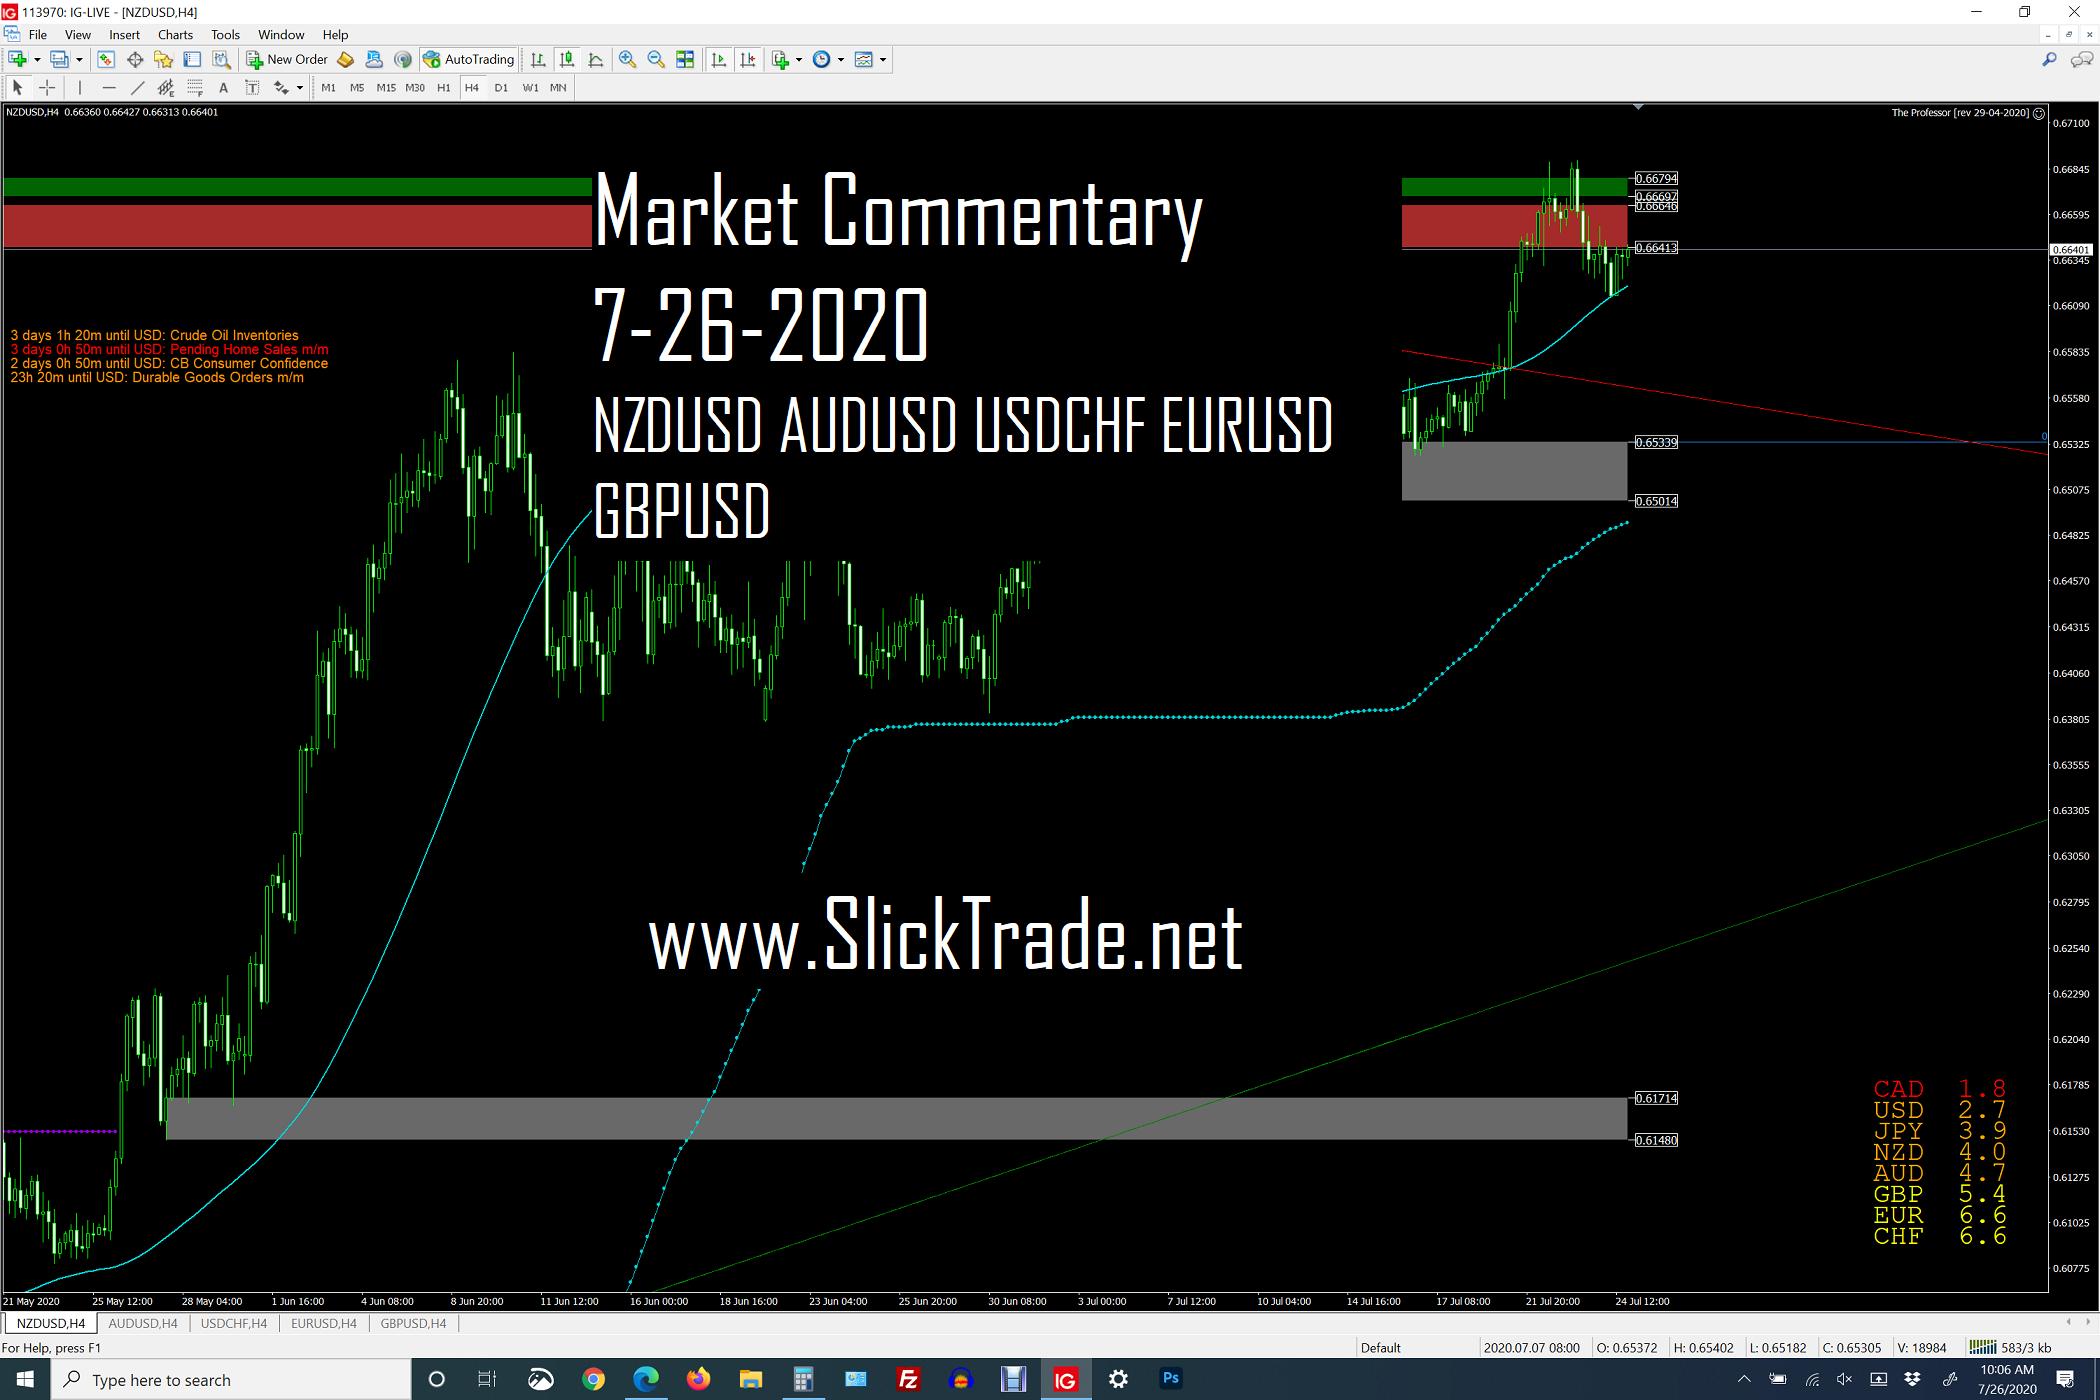 Market Commentary 7-26-2020 - NZDUSD AUDUSD USDCHF EURUSD GBPUSD